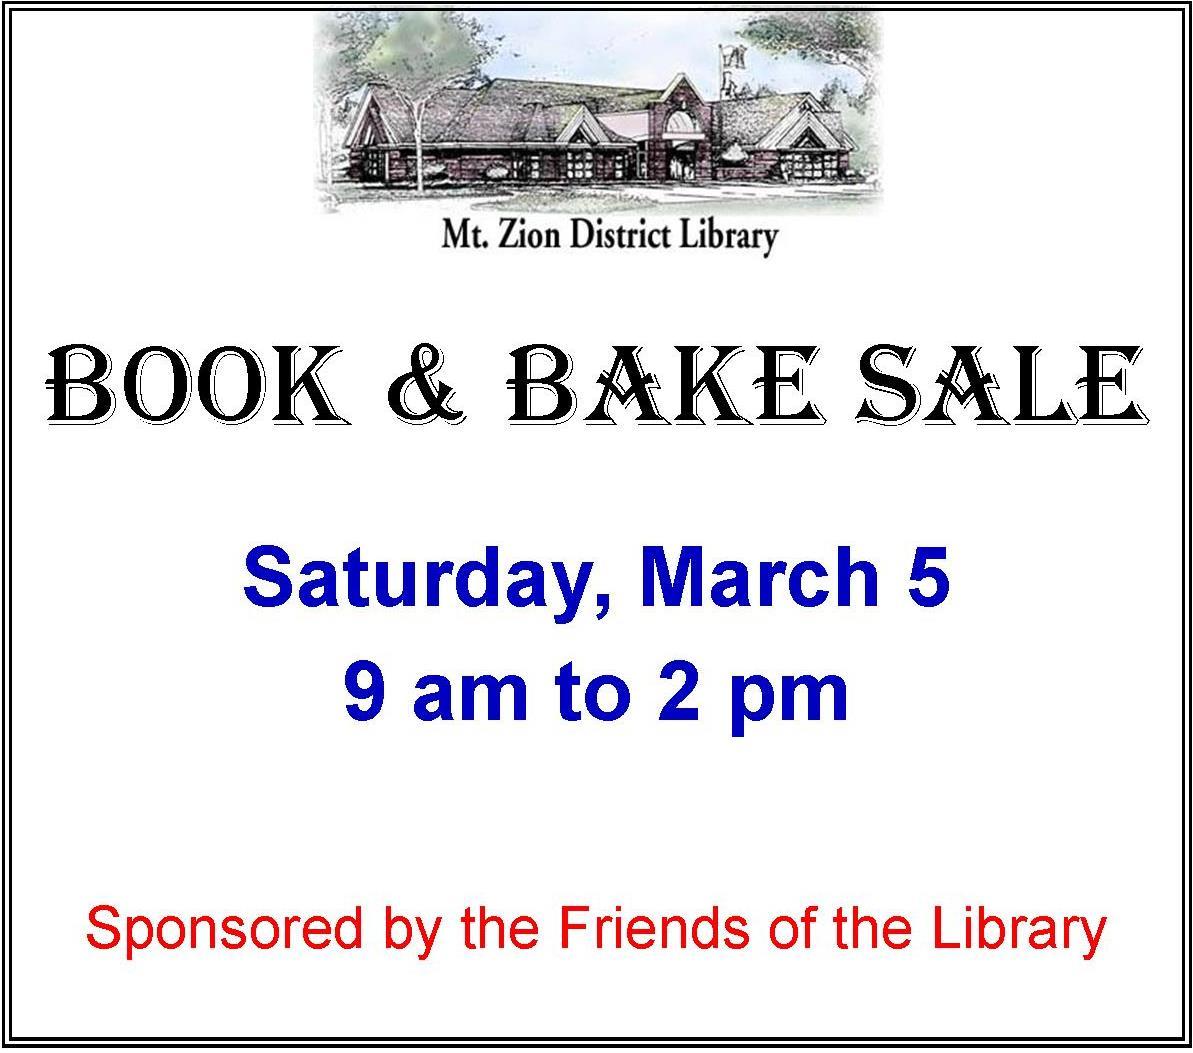 Friends Book Sale Sign March 5 2016.jpg